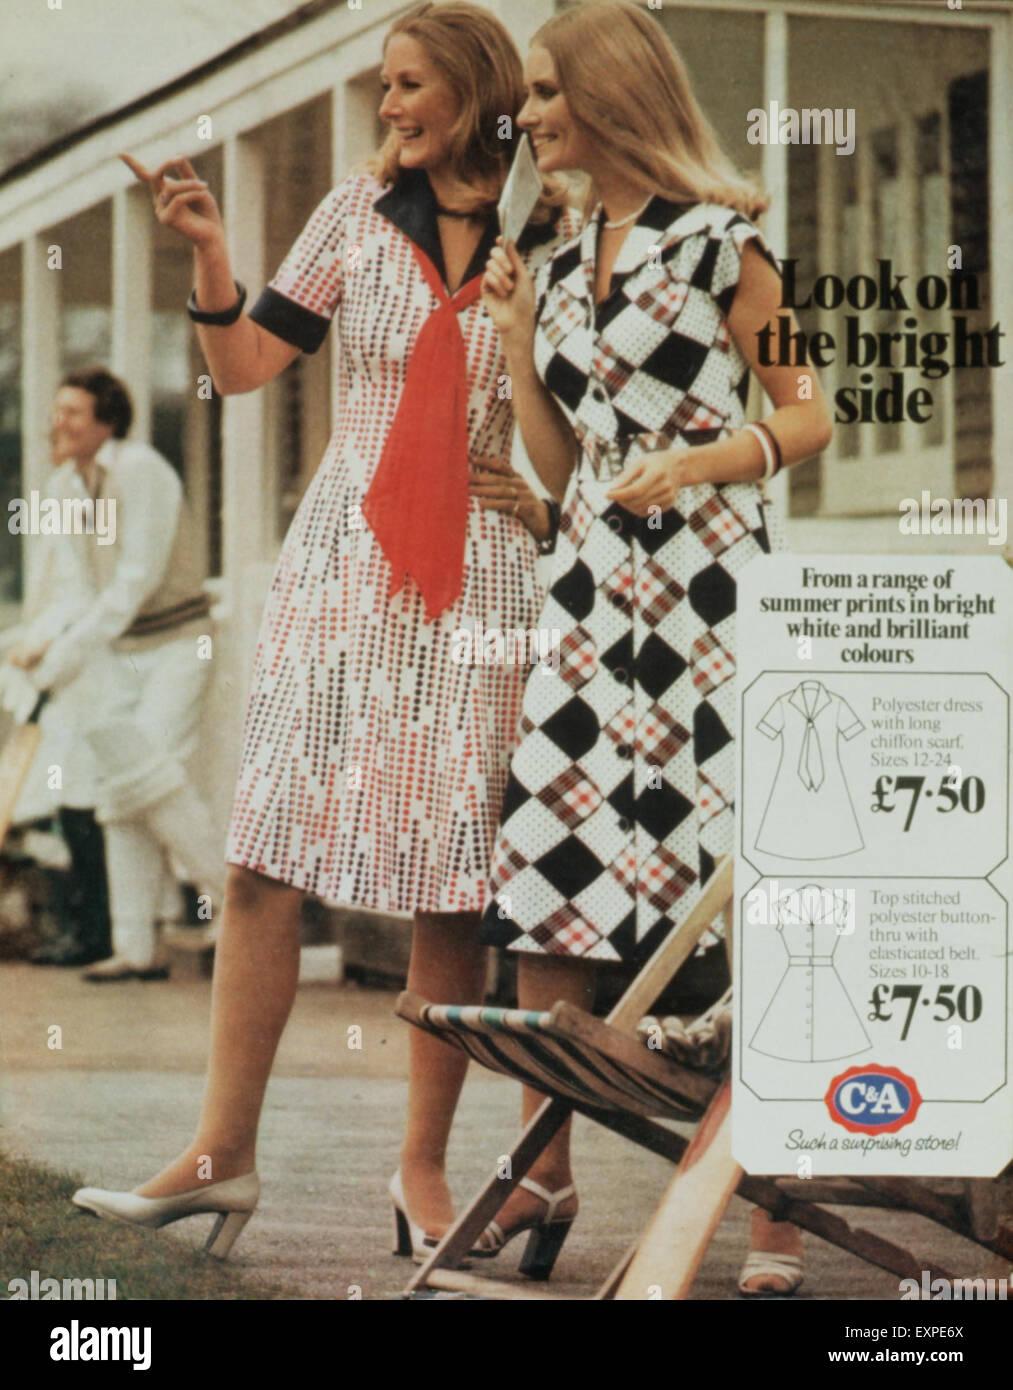 1970s UK C&A Magazine Advert - Stock Image